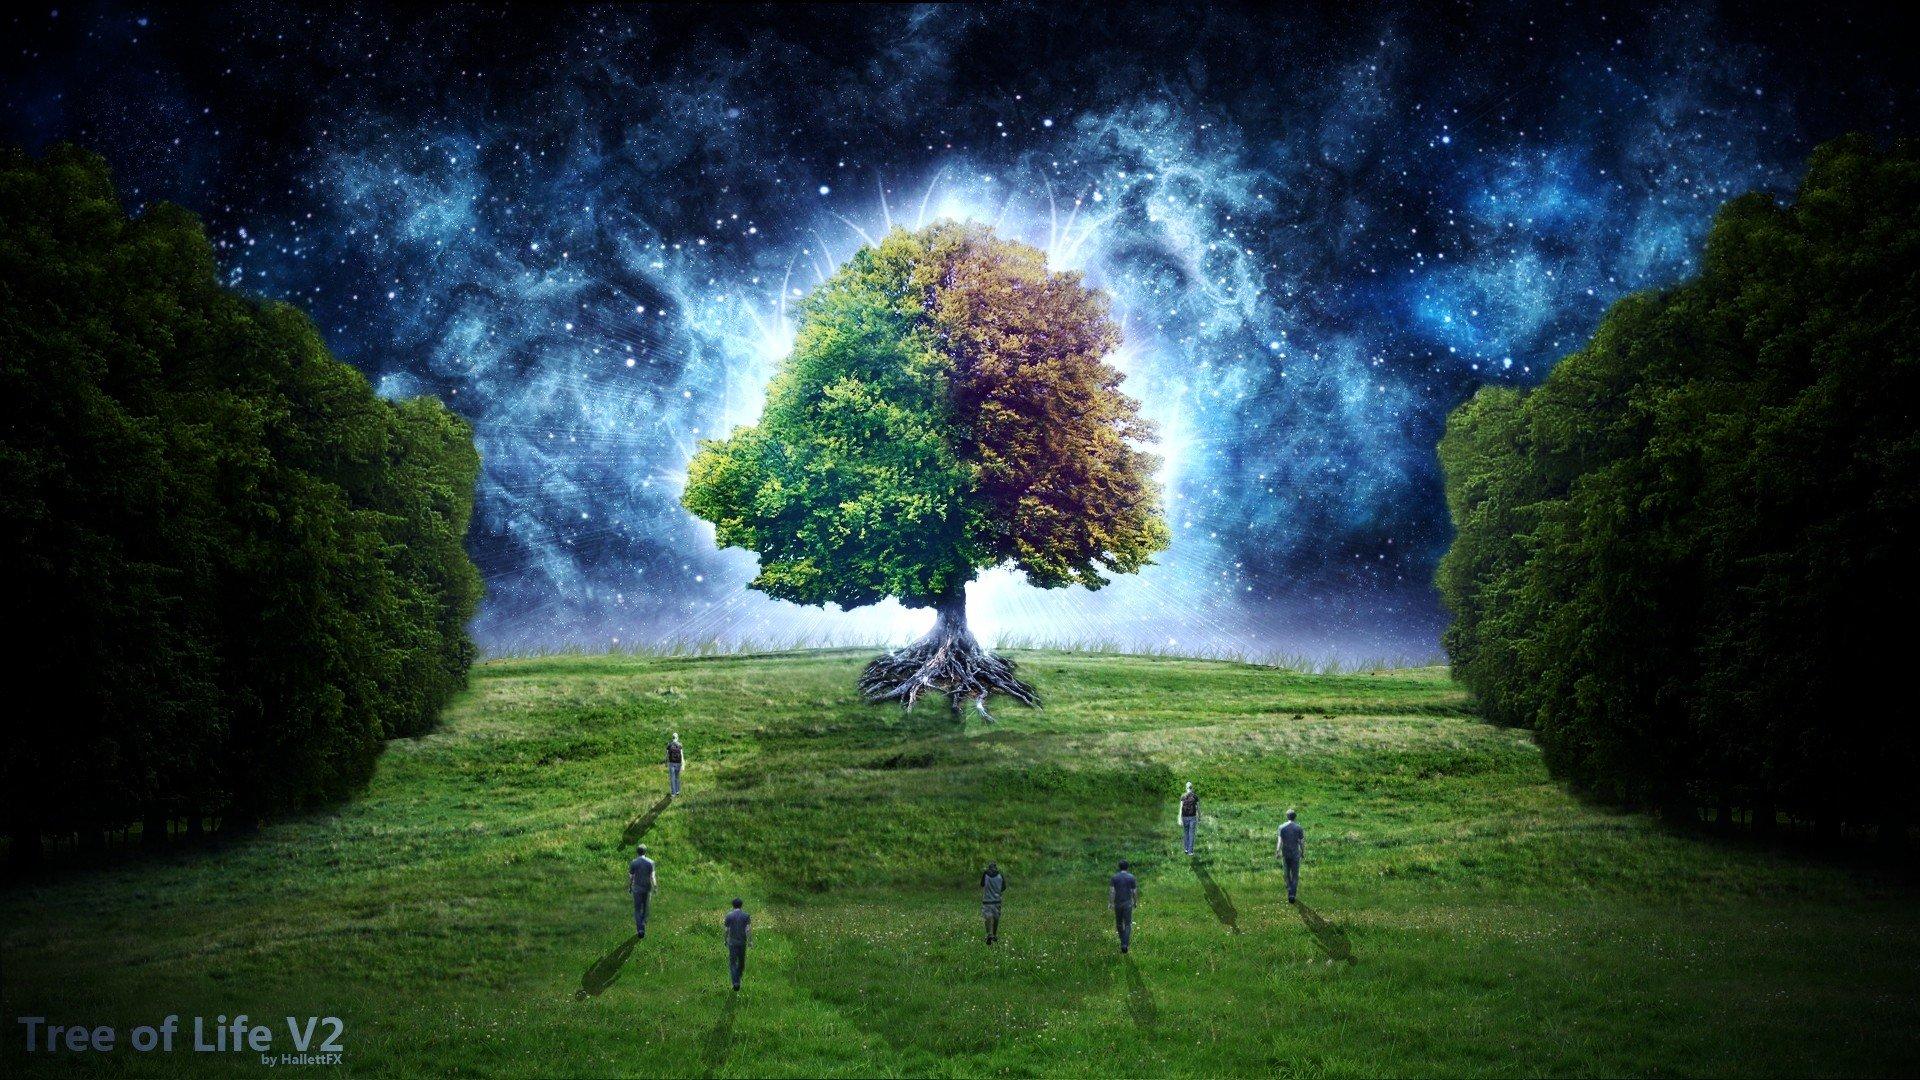 digital art Tree Of Life Starry Night Fantastic wallpaper background 1920x1080